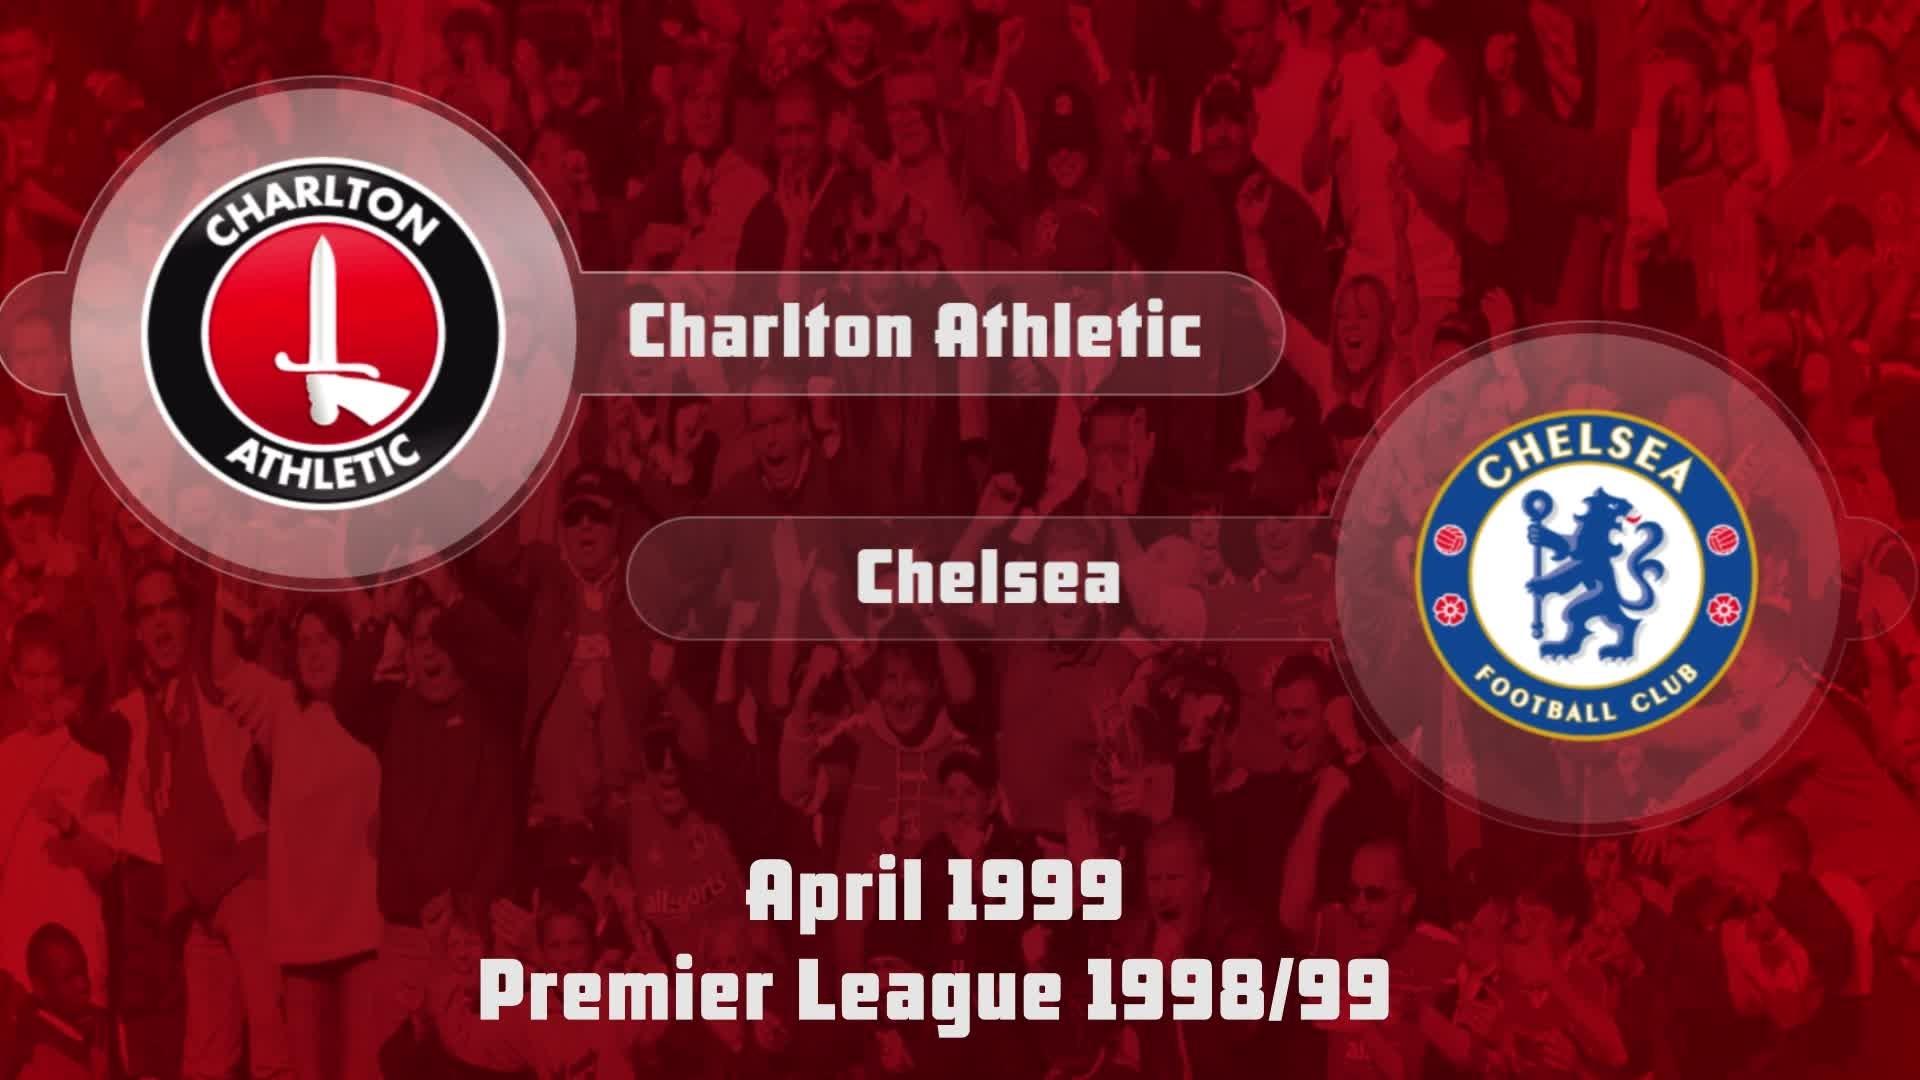 34 HIGHLIGHTS | Charlton 0 Chelsea 1 (April 1999)